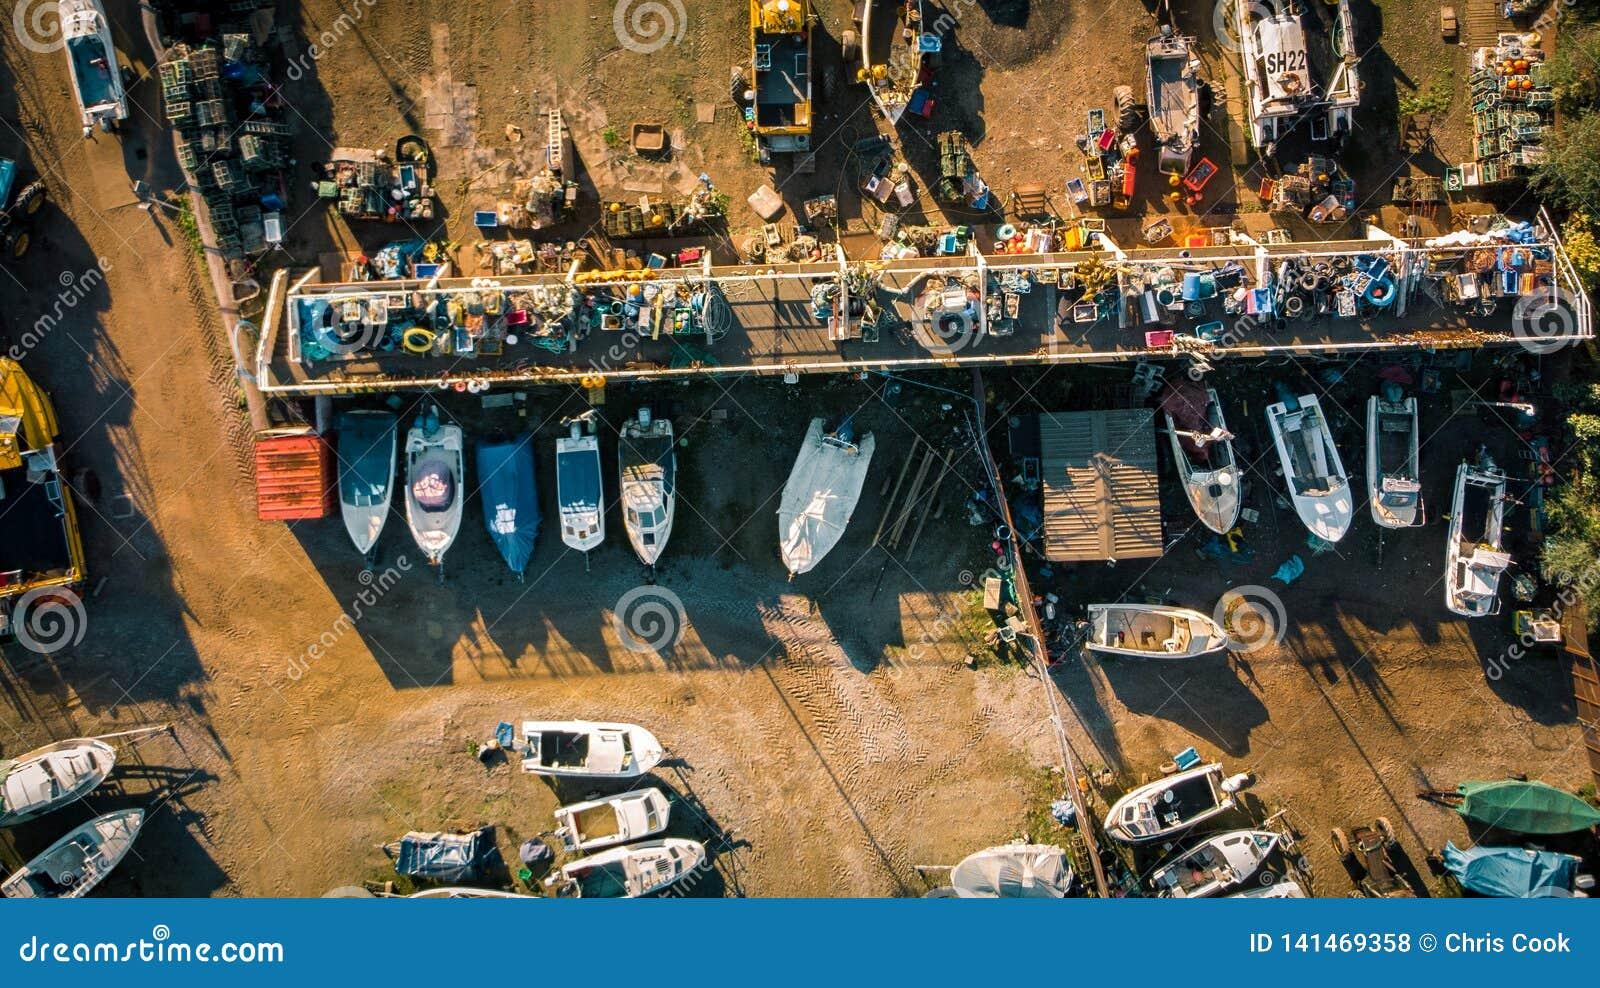 A fishing boat yard